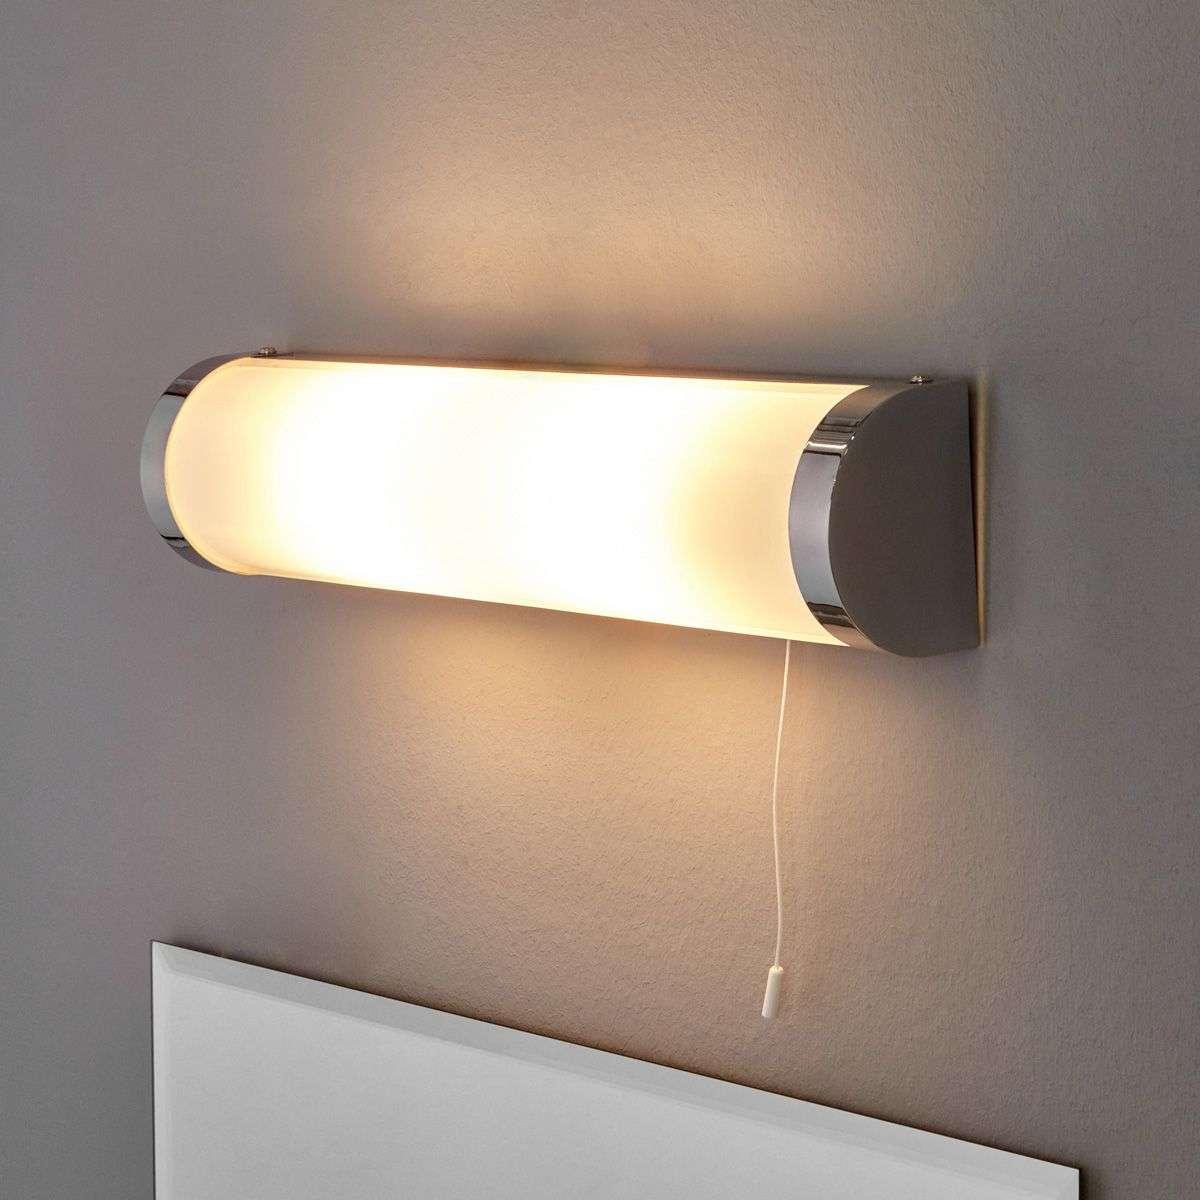 Practical LIANA bathroom light, IP44 | Lights.ie